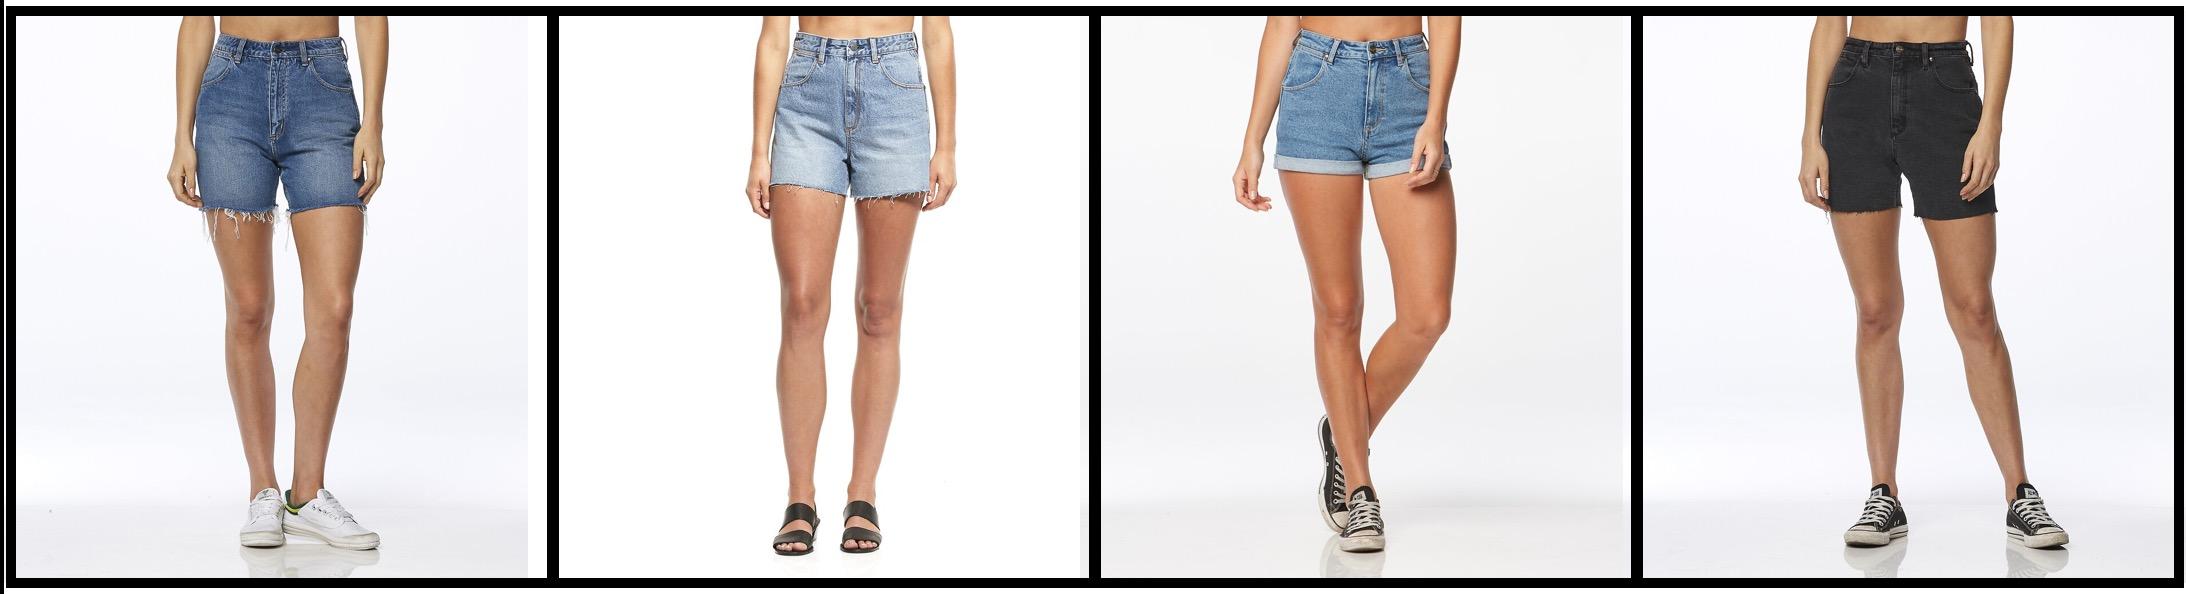 so many shorts - just add sun